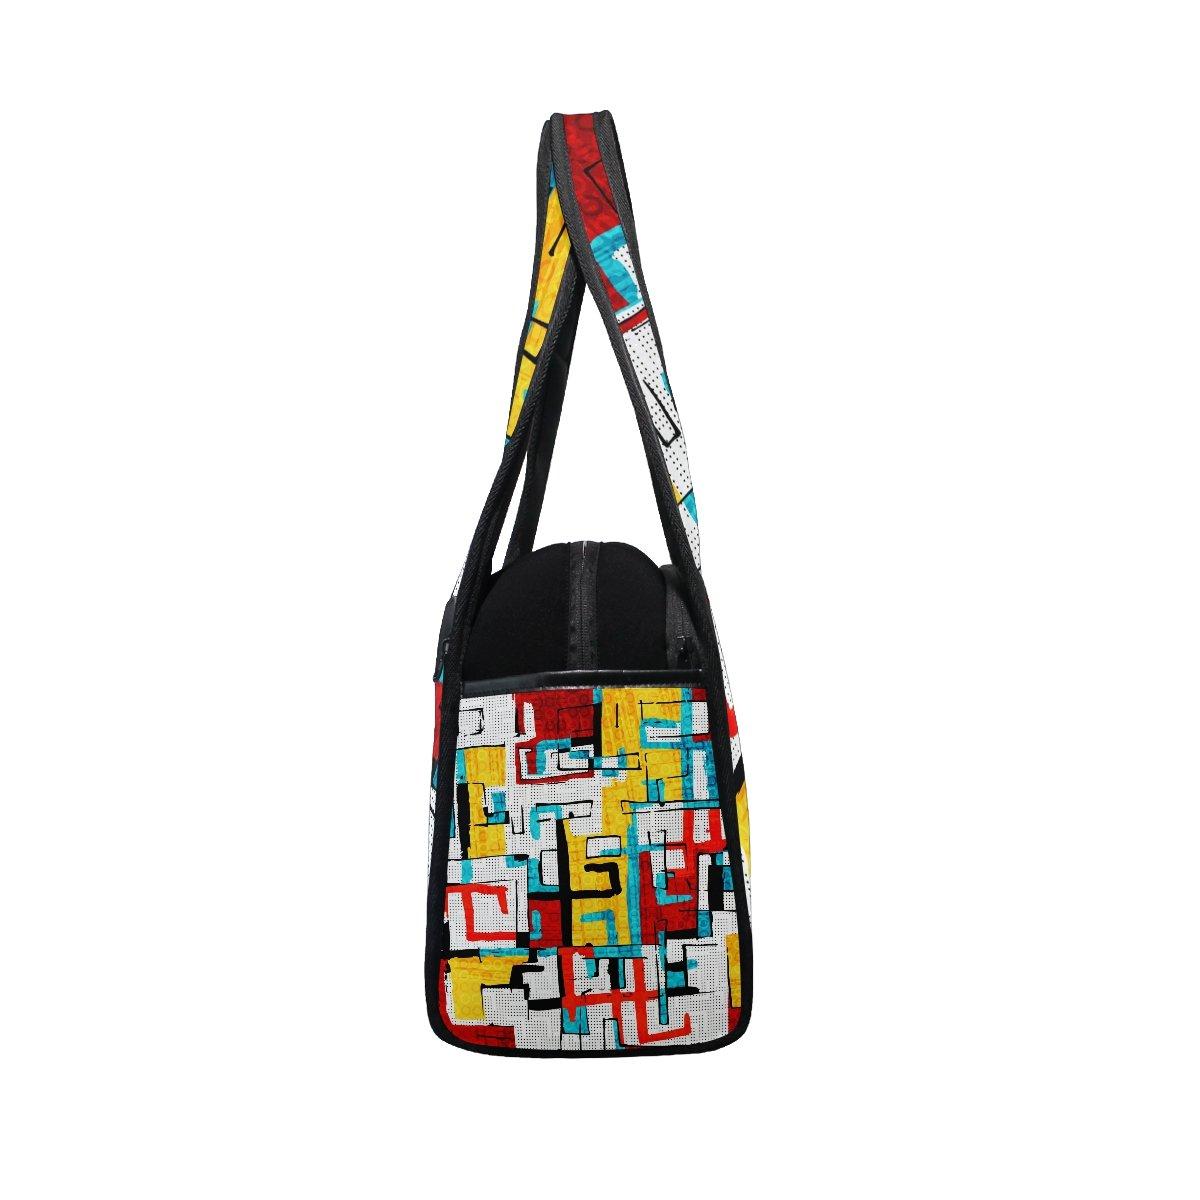 Gym Bag Sports Holdall Abstract Graffiti Hip Hop Canvas Shoulder Bag Overnight Travel Bag for Men and Women